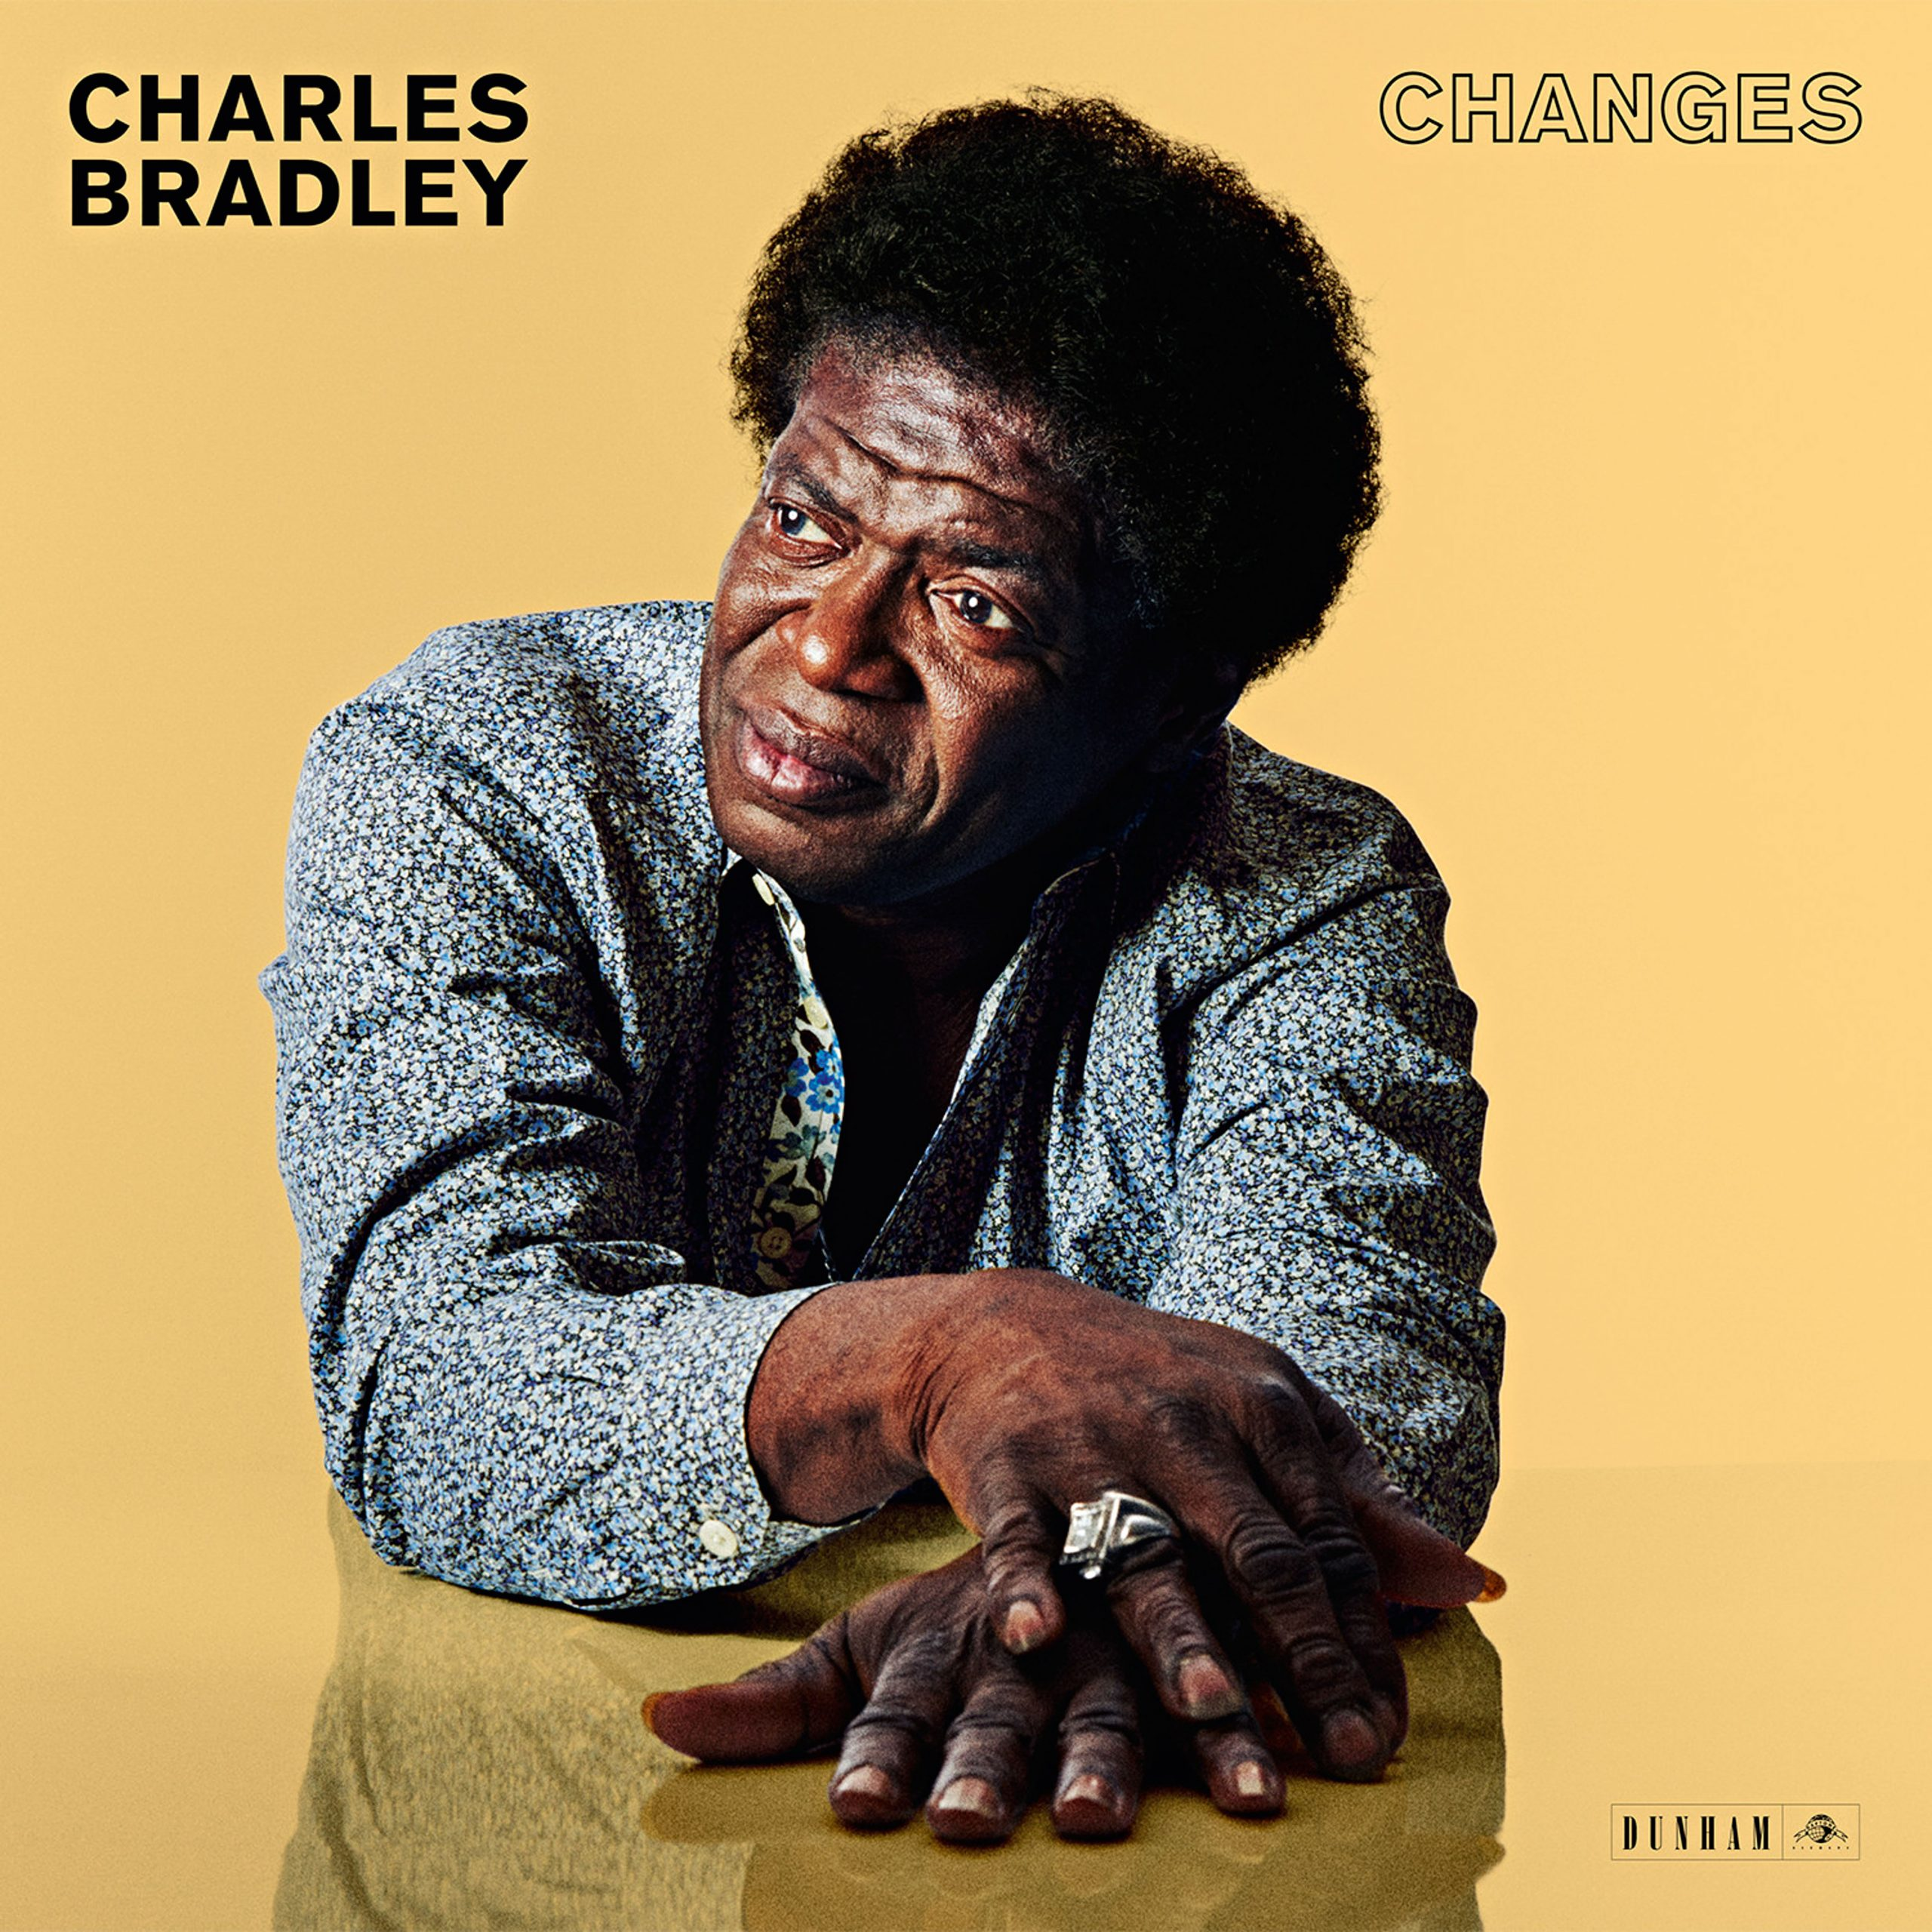 Charles_Bradley_-_Changes_Cover_Art